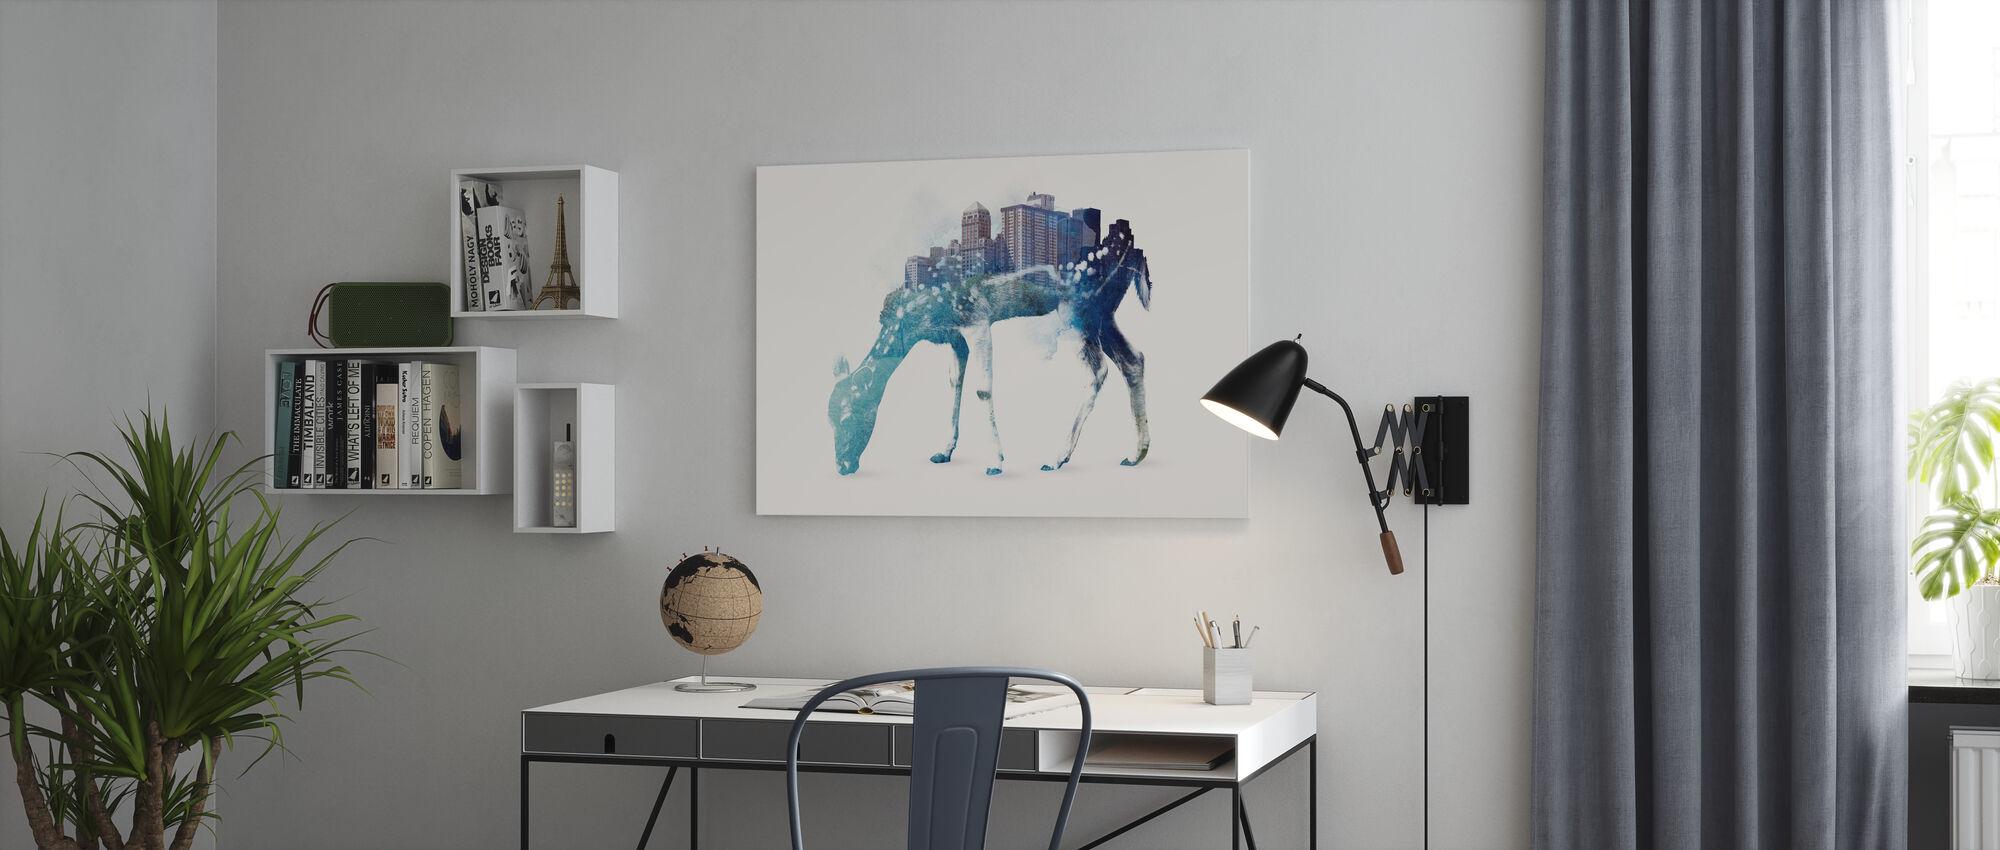 City Deer - Canvas print - Office